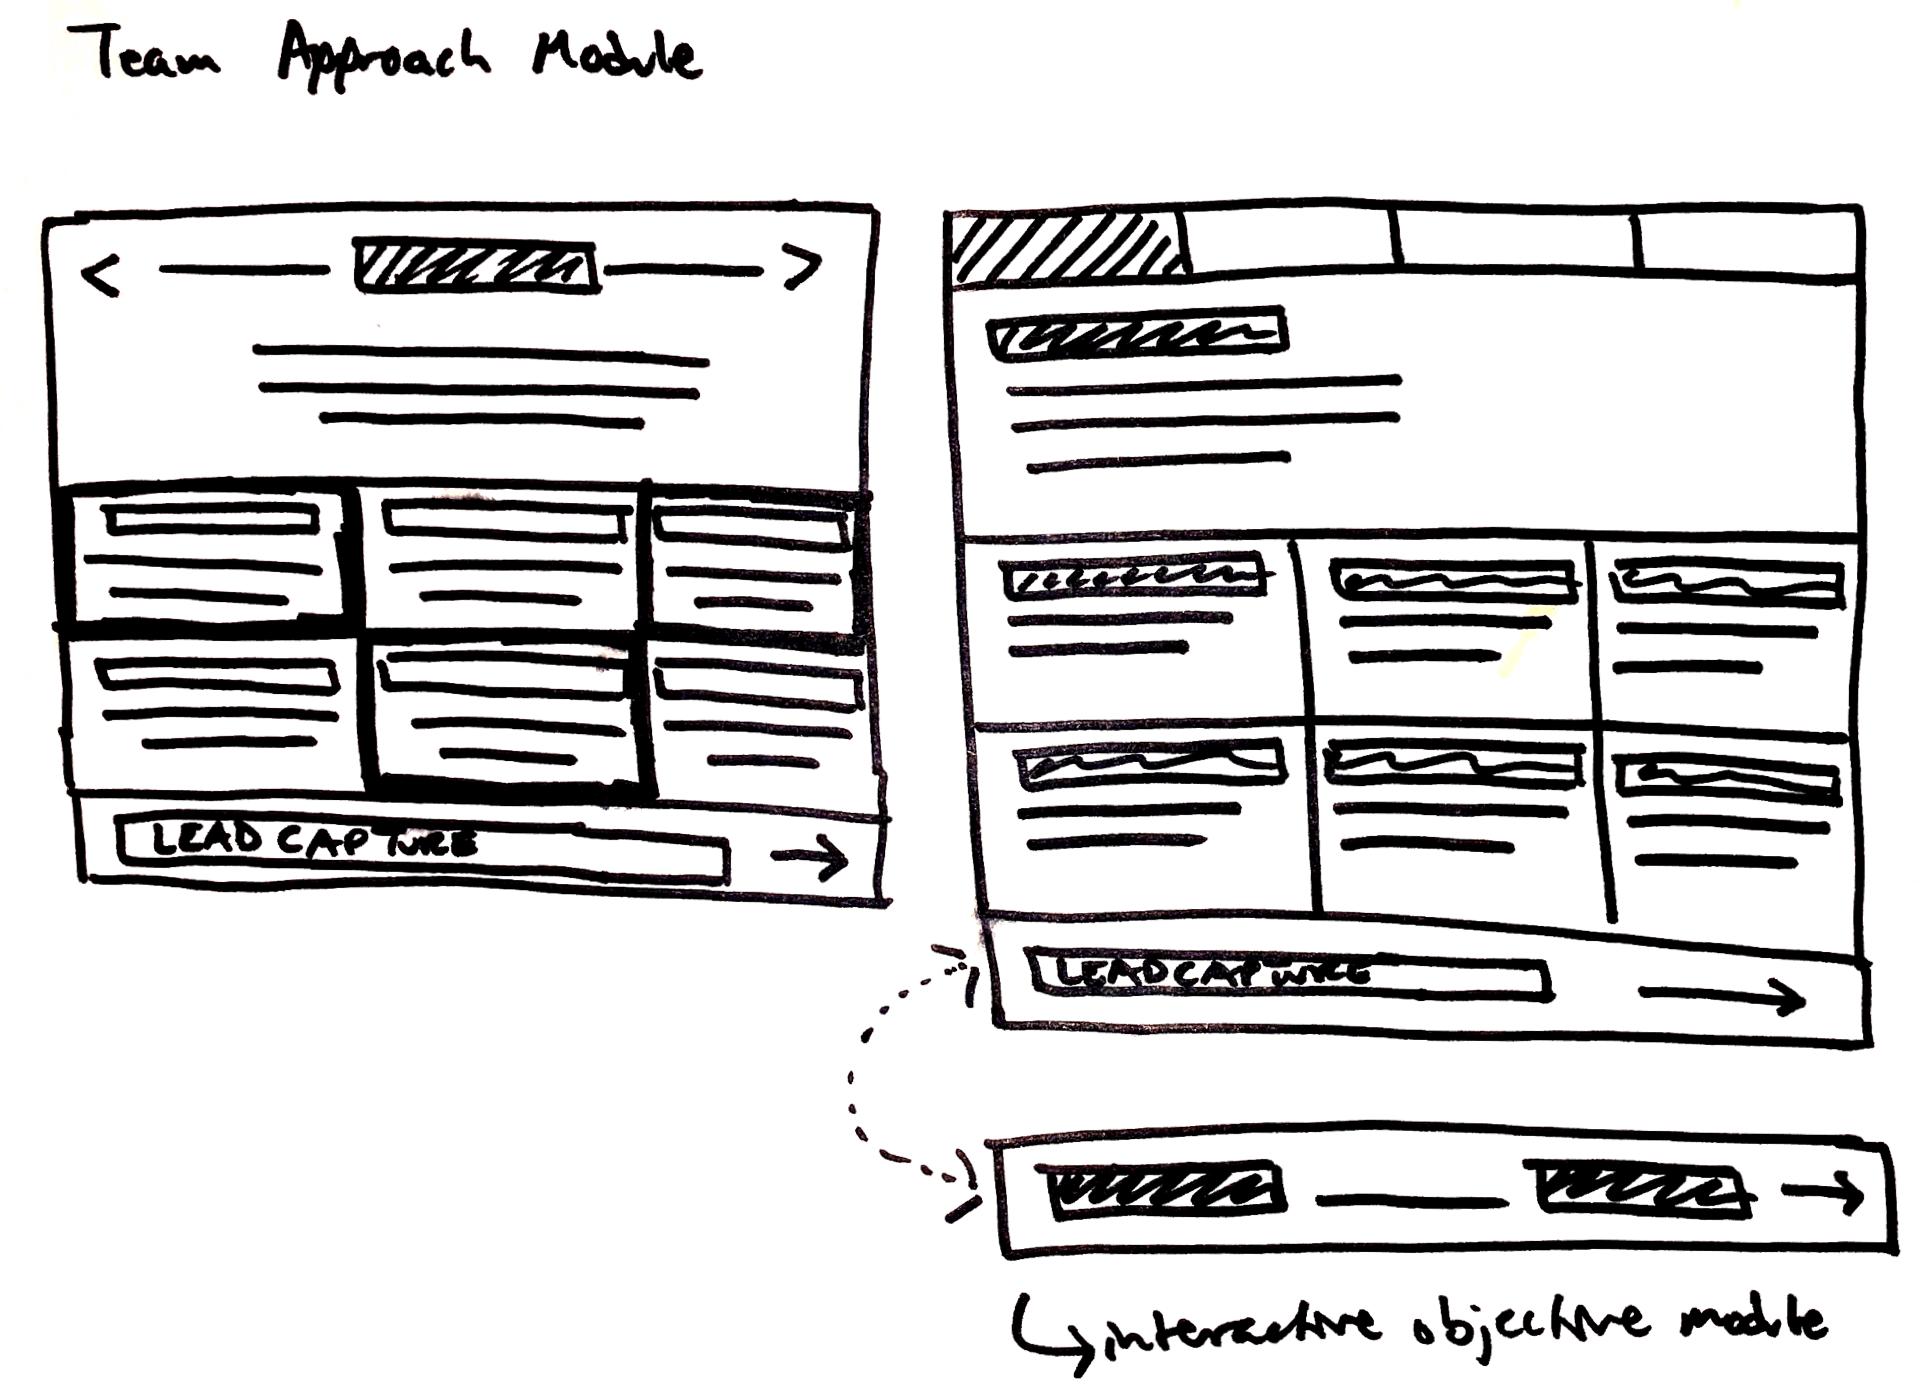 Team Approach Module